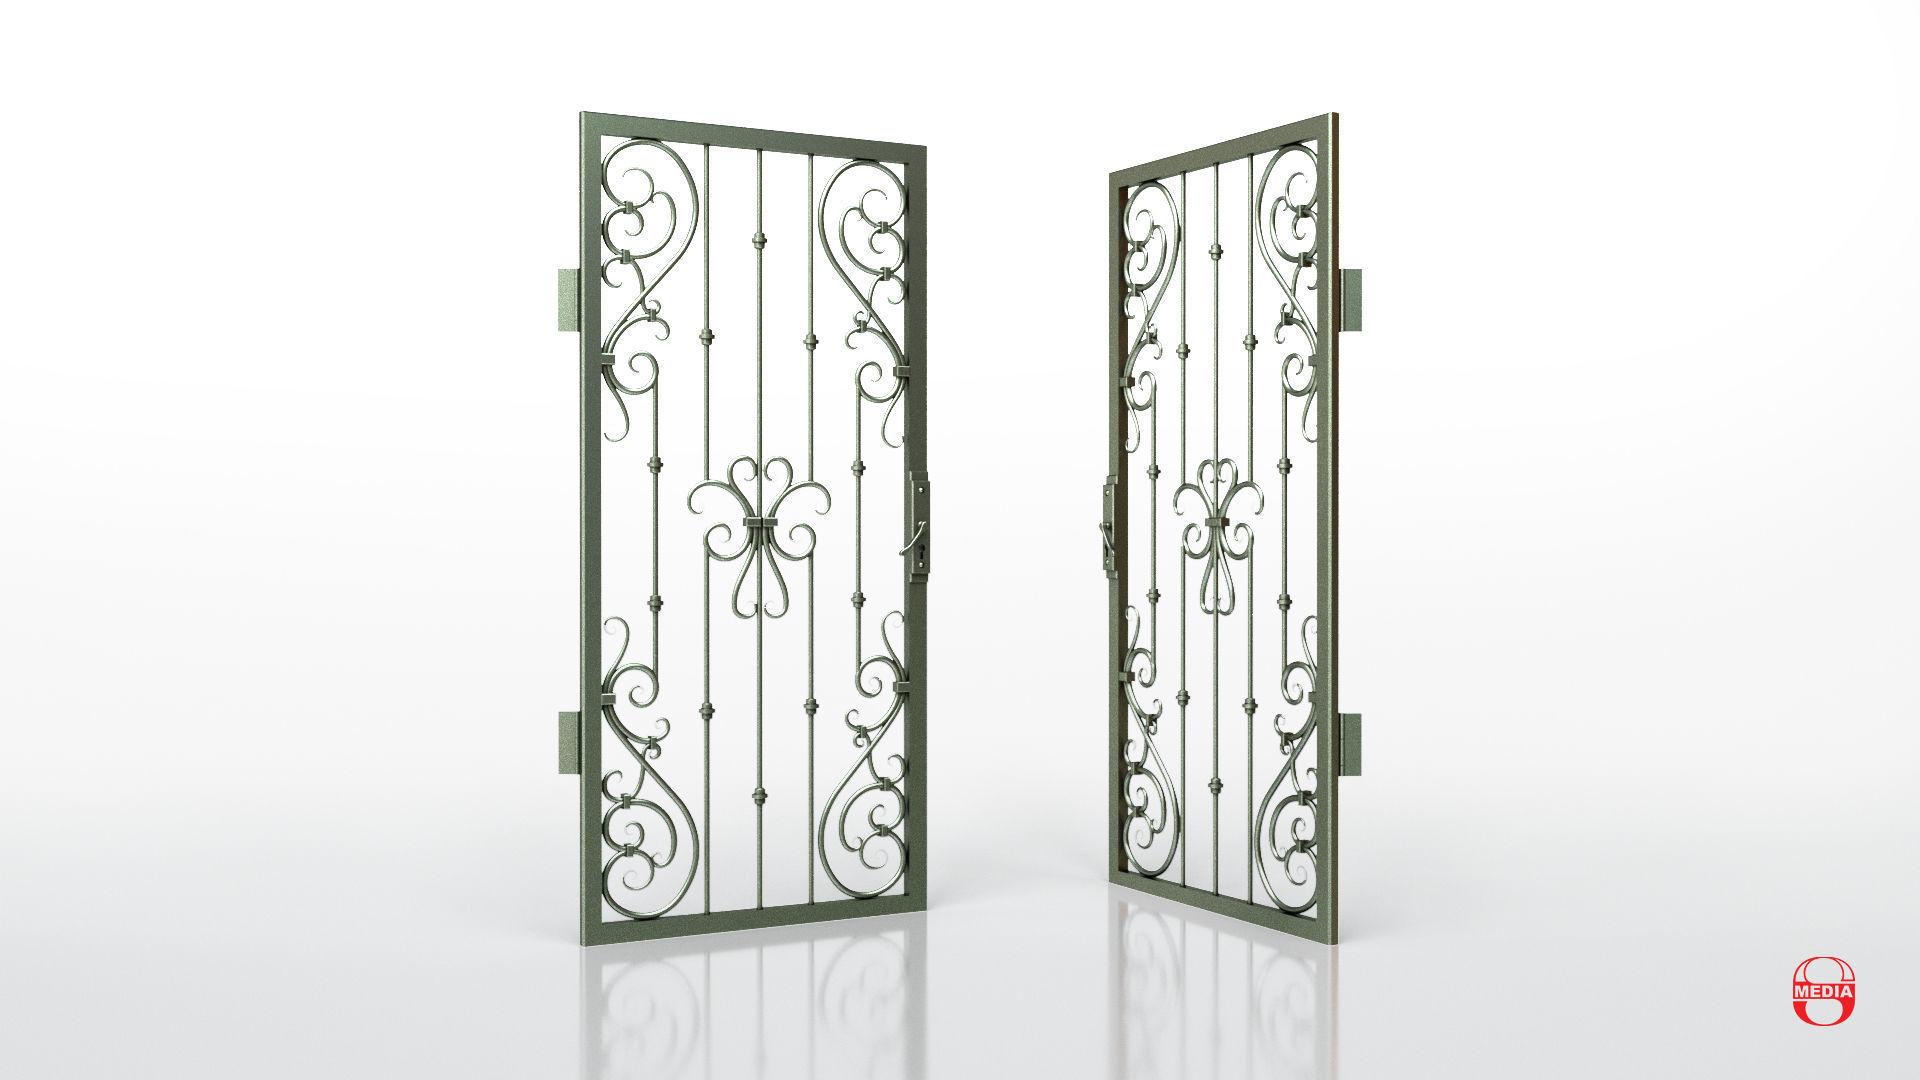 Metal Grille Gate